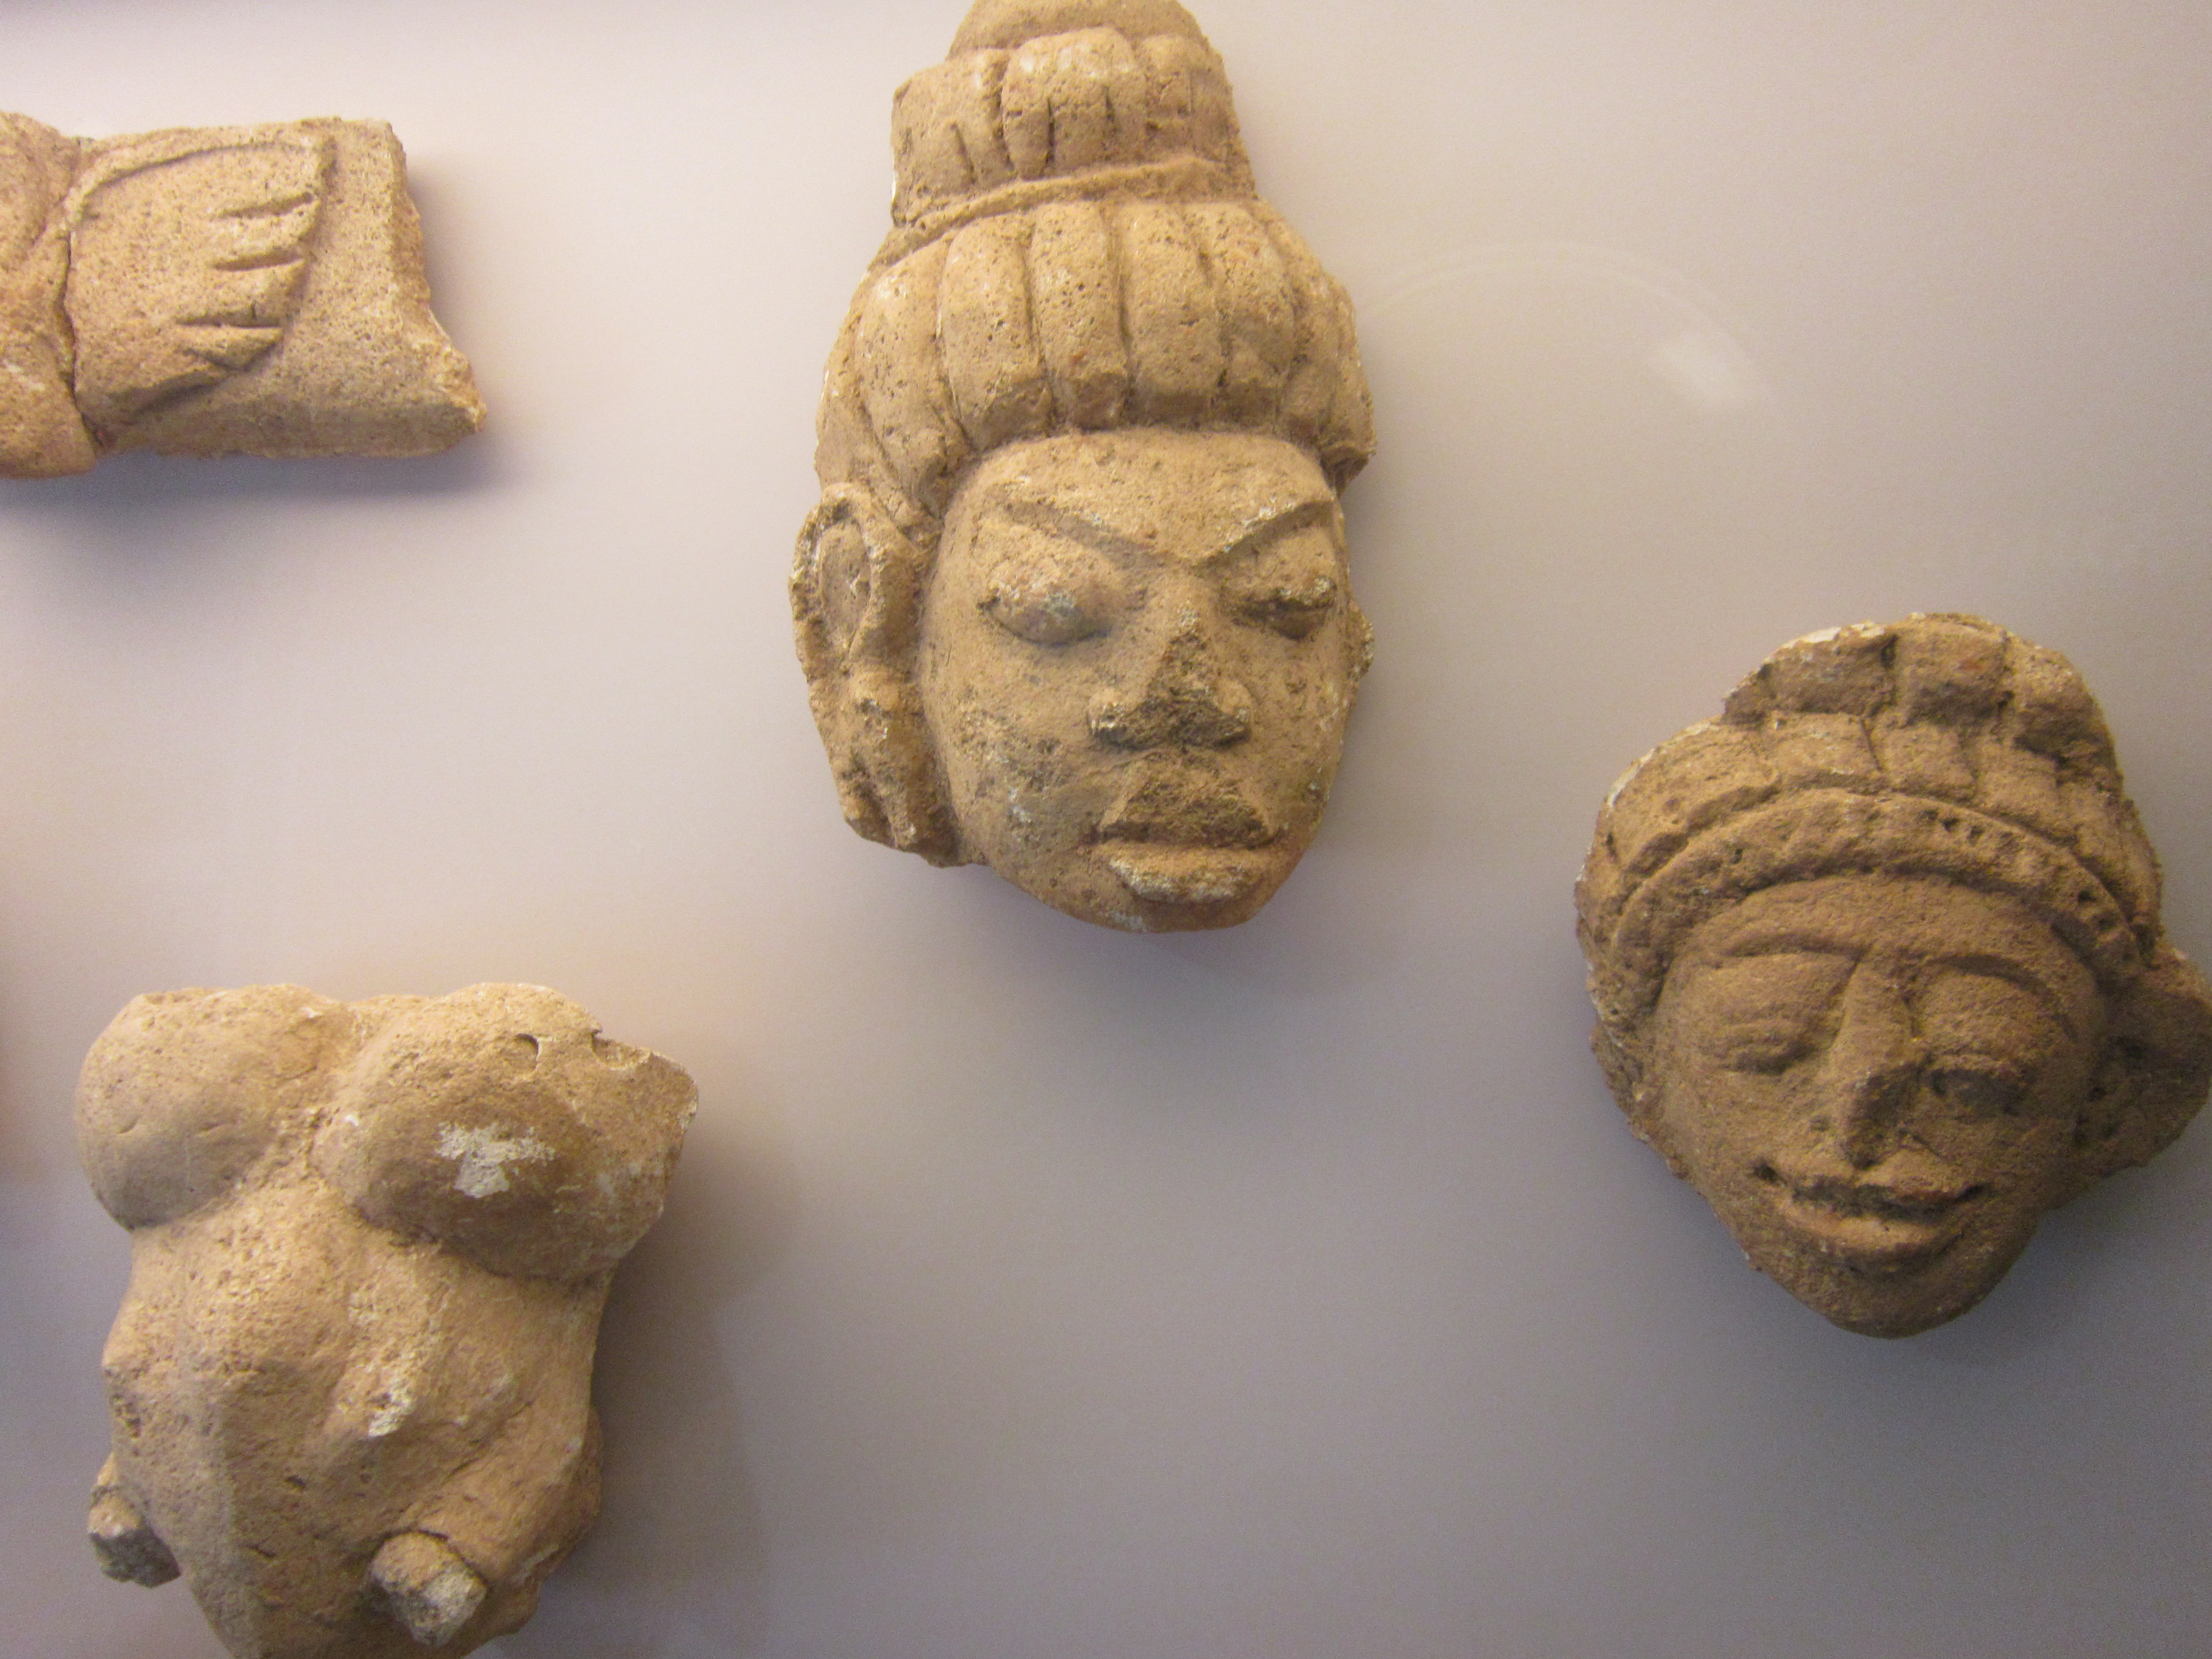 Items on display in Lopburi Somdet Phra Narai National Museum.